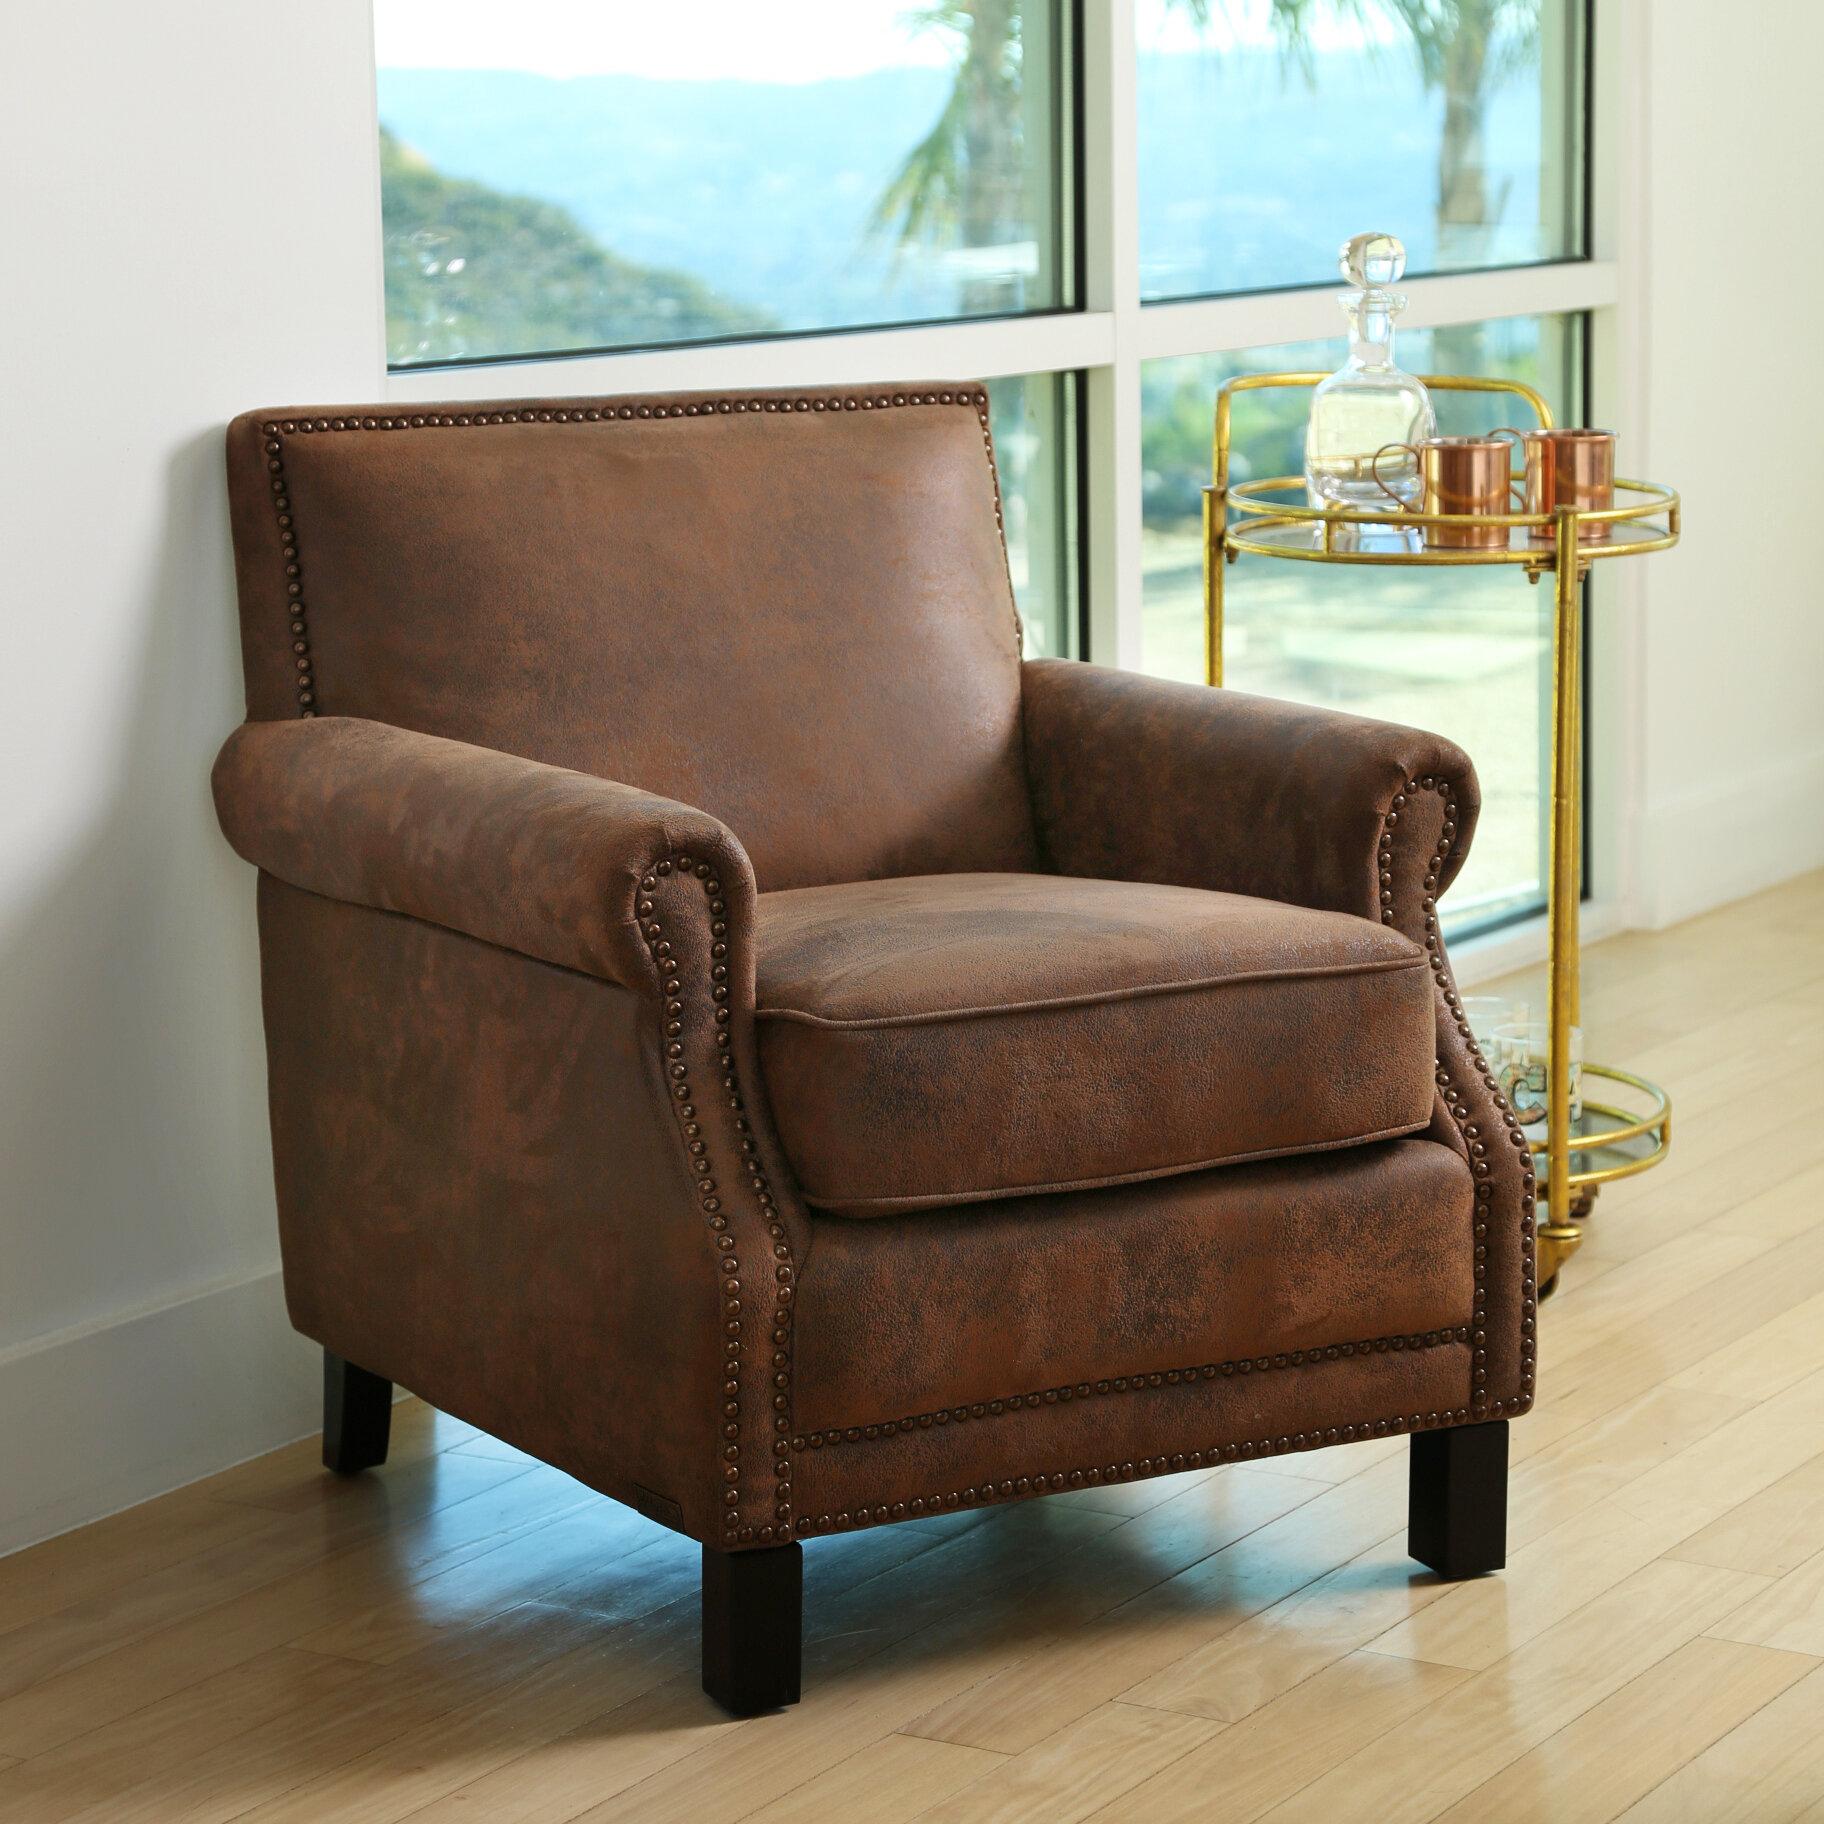 "Asbury 28"" W Club Chair Pertaining To Asbury Club Chairs (View 3 of 15)"